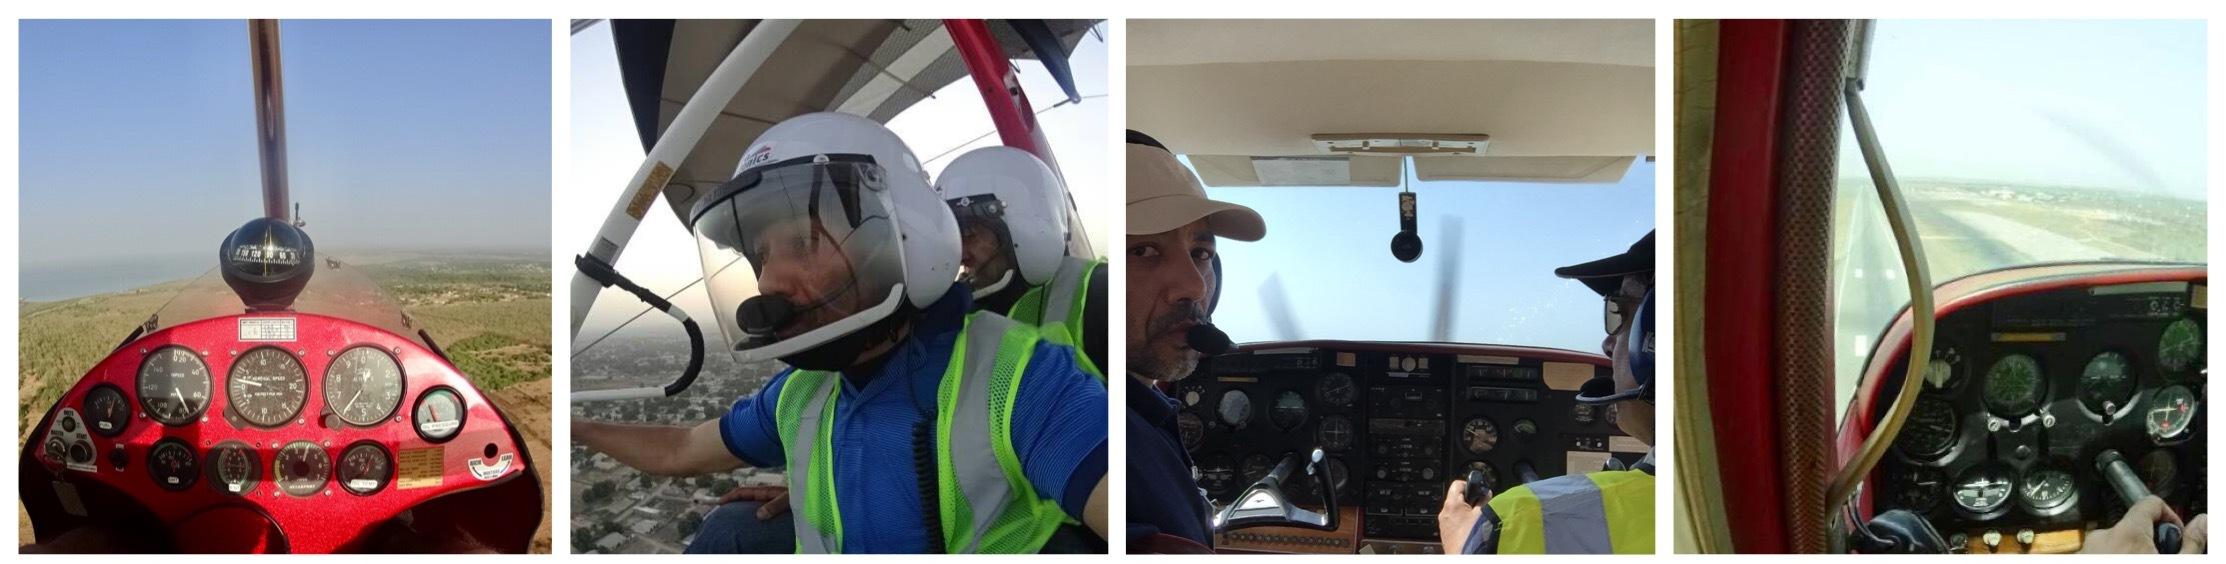 Flying in The Gambia 1.jpg